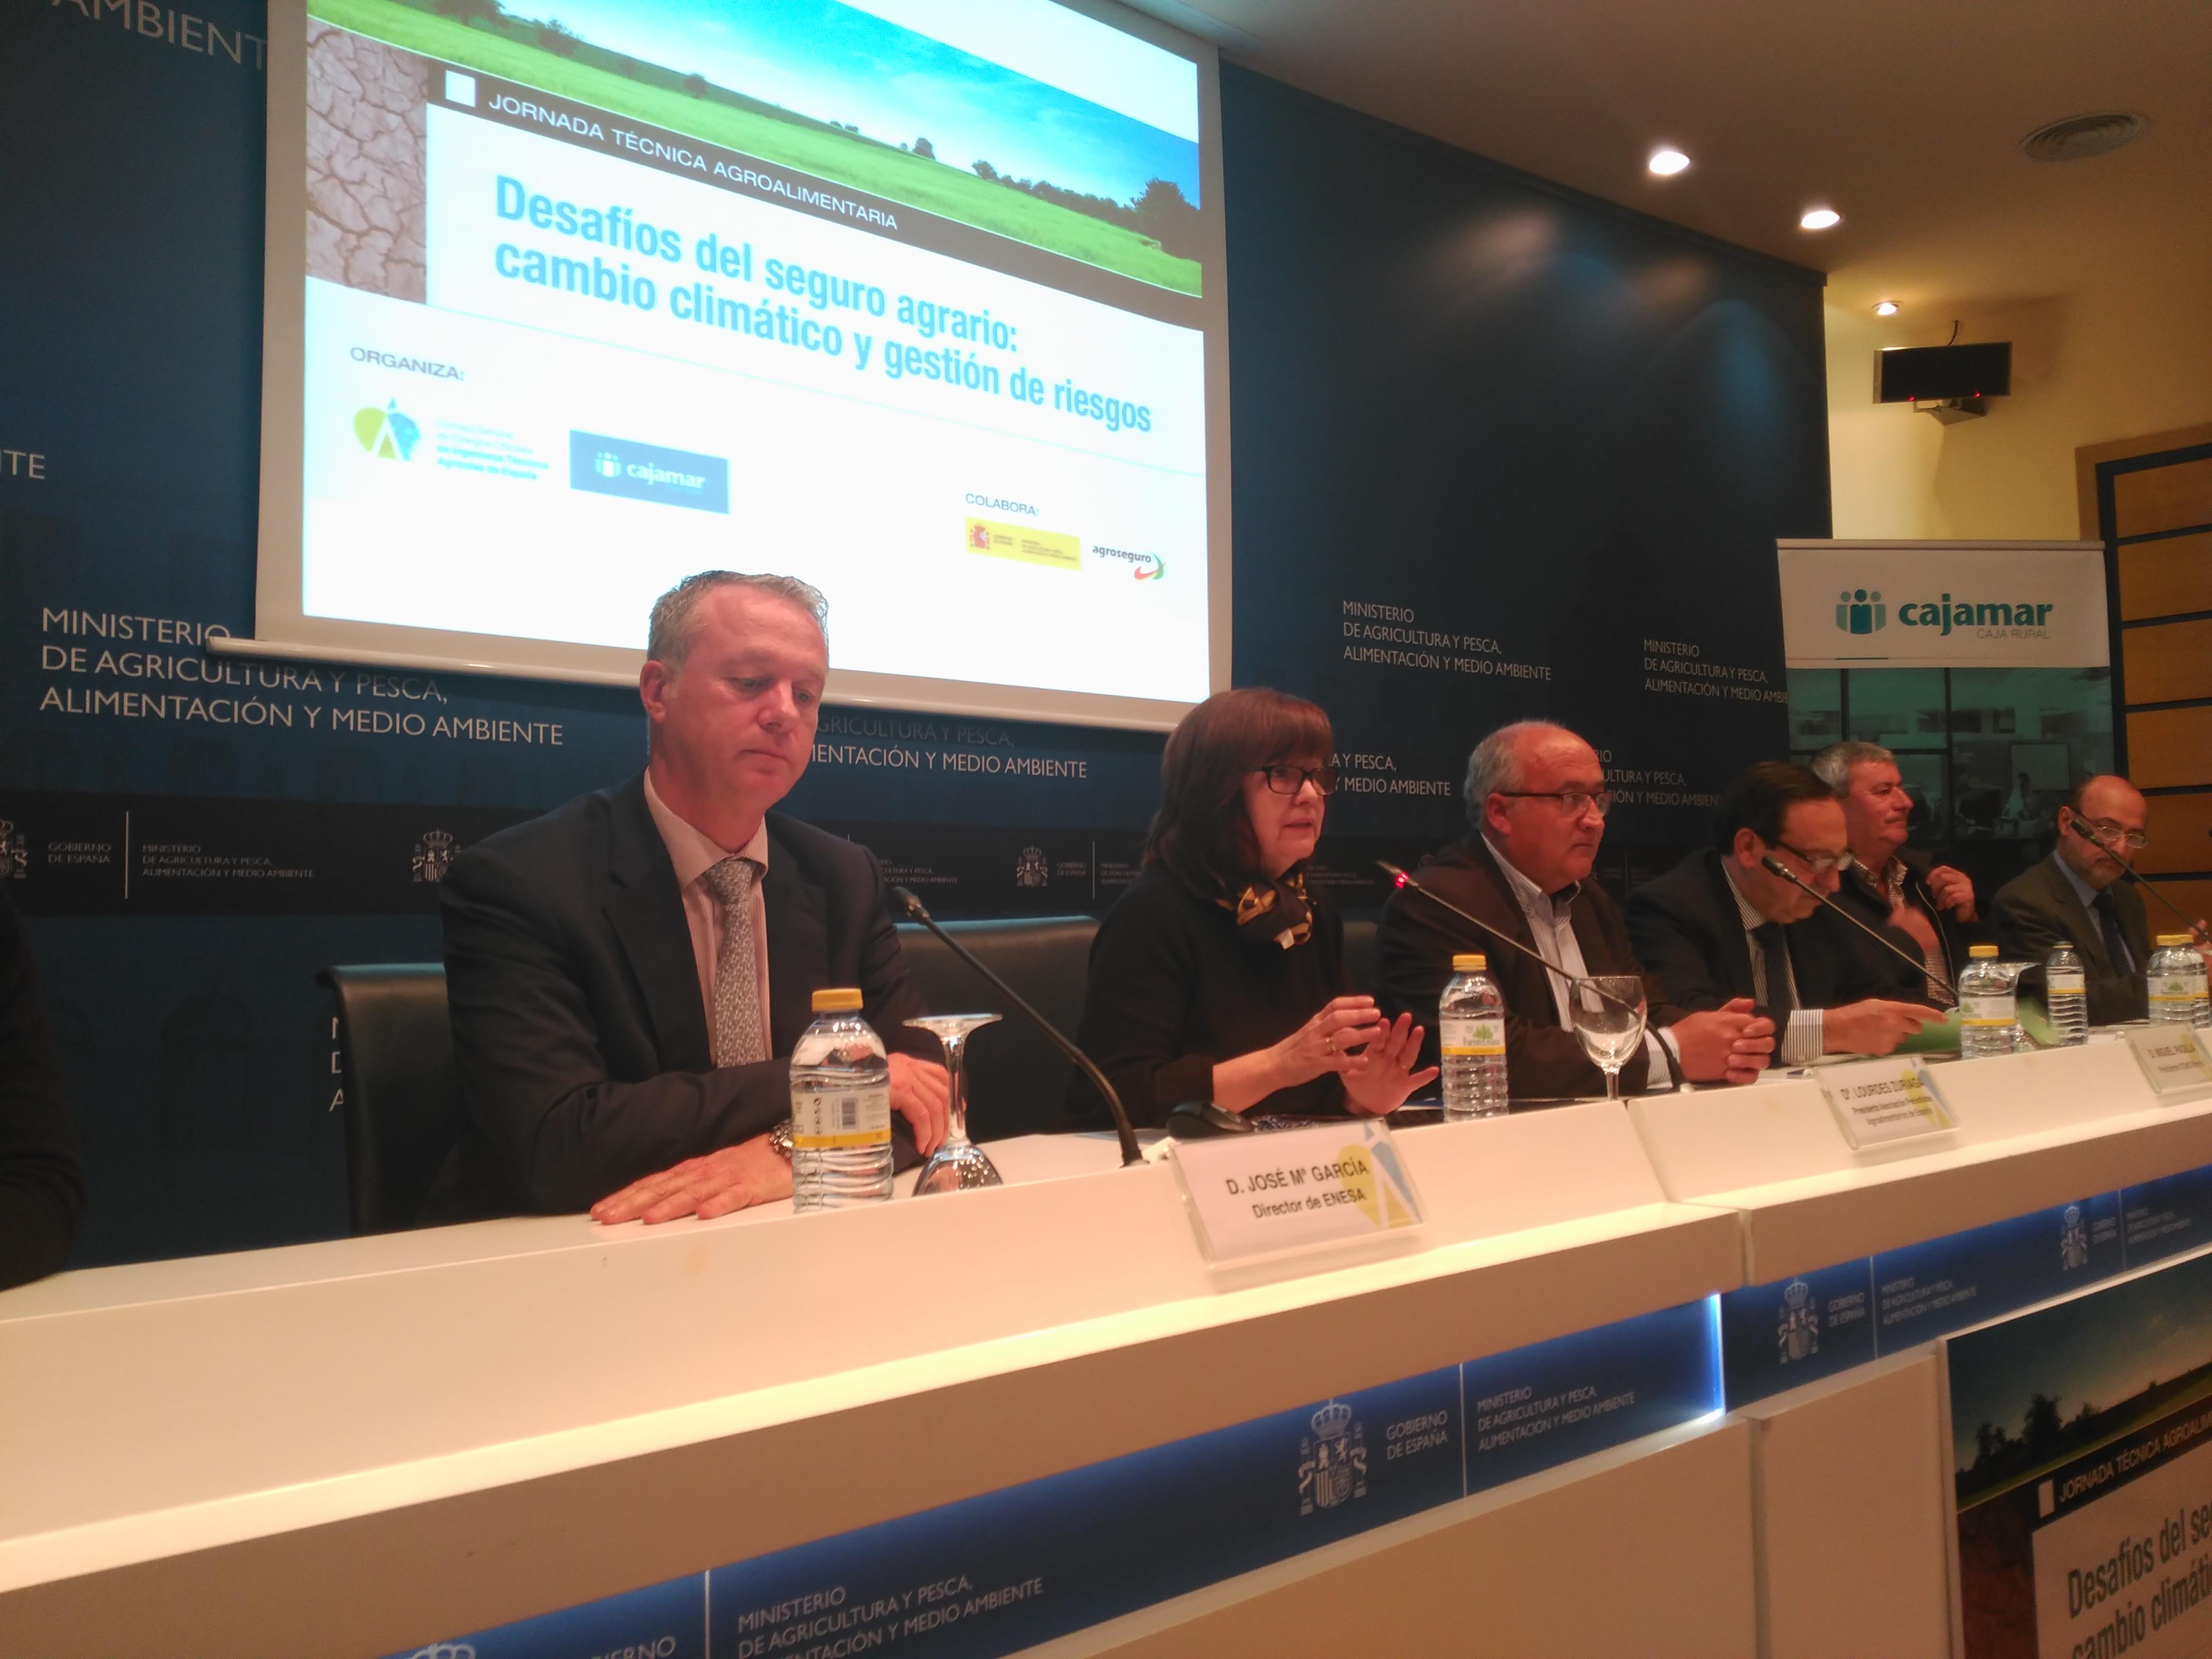 Seguros agrarios y cambio climático, a debate